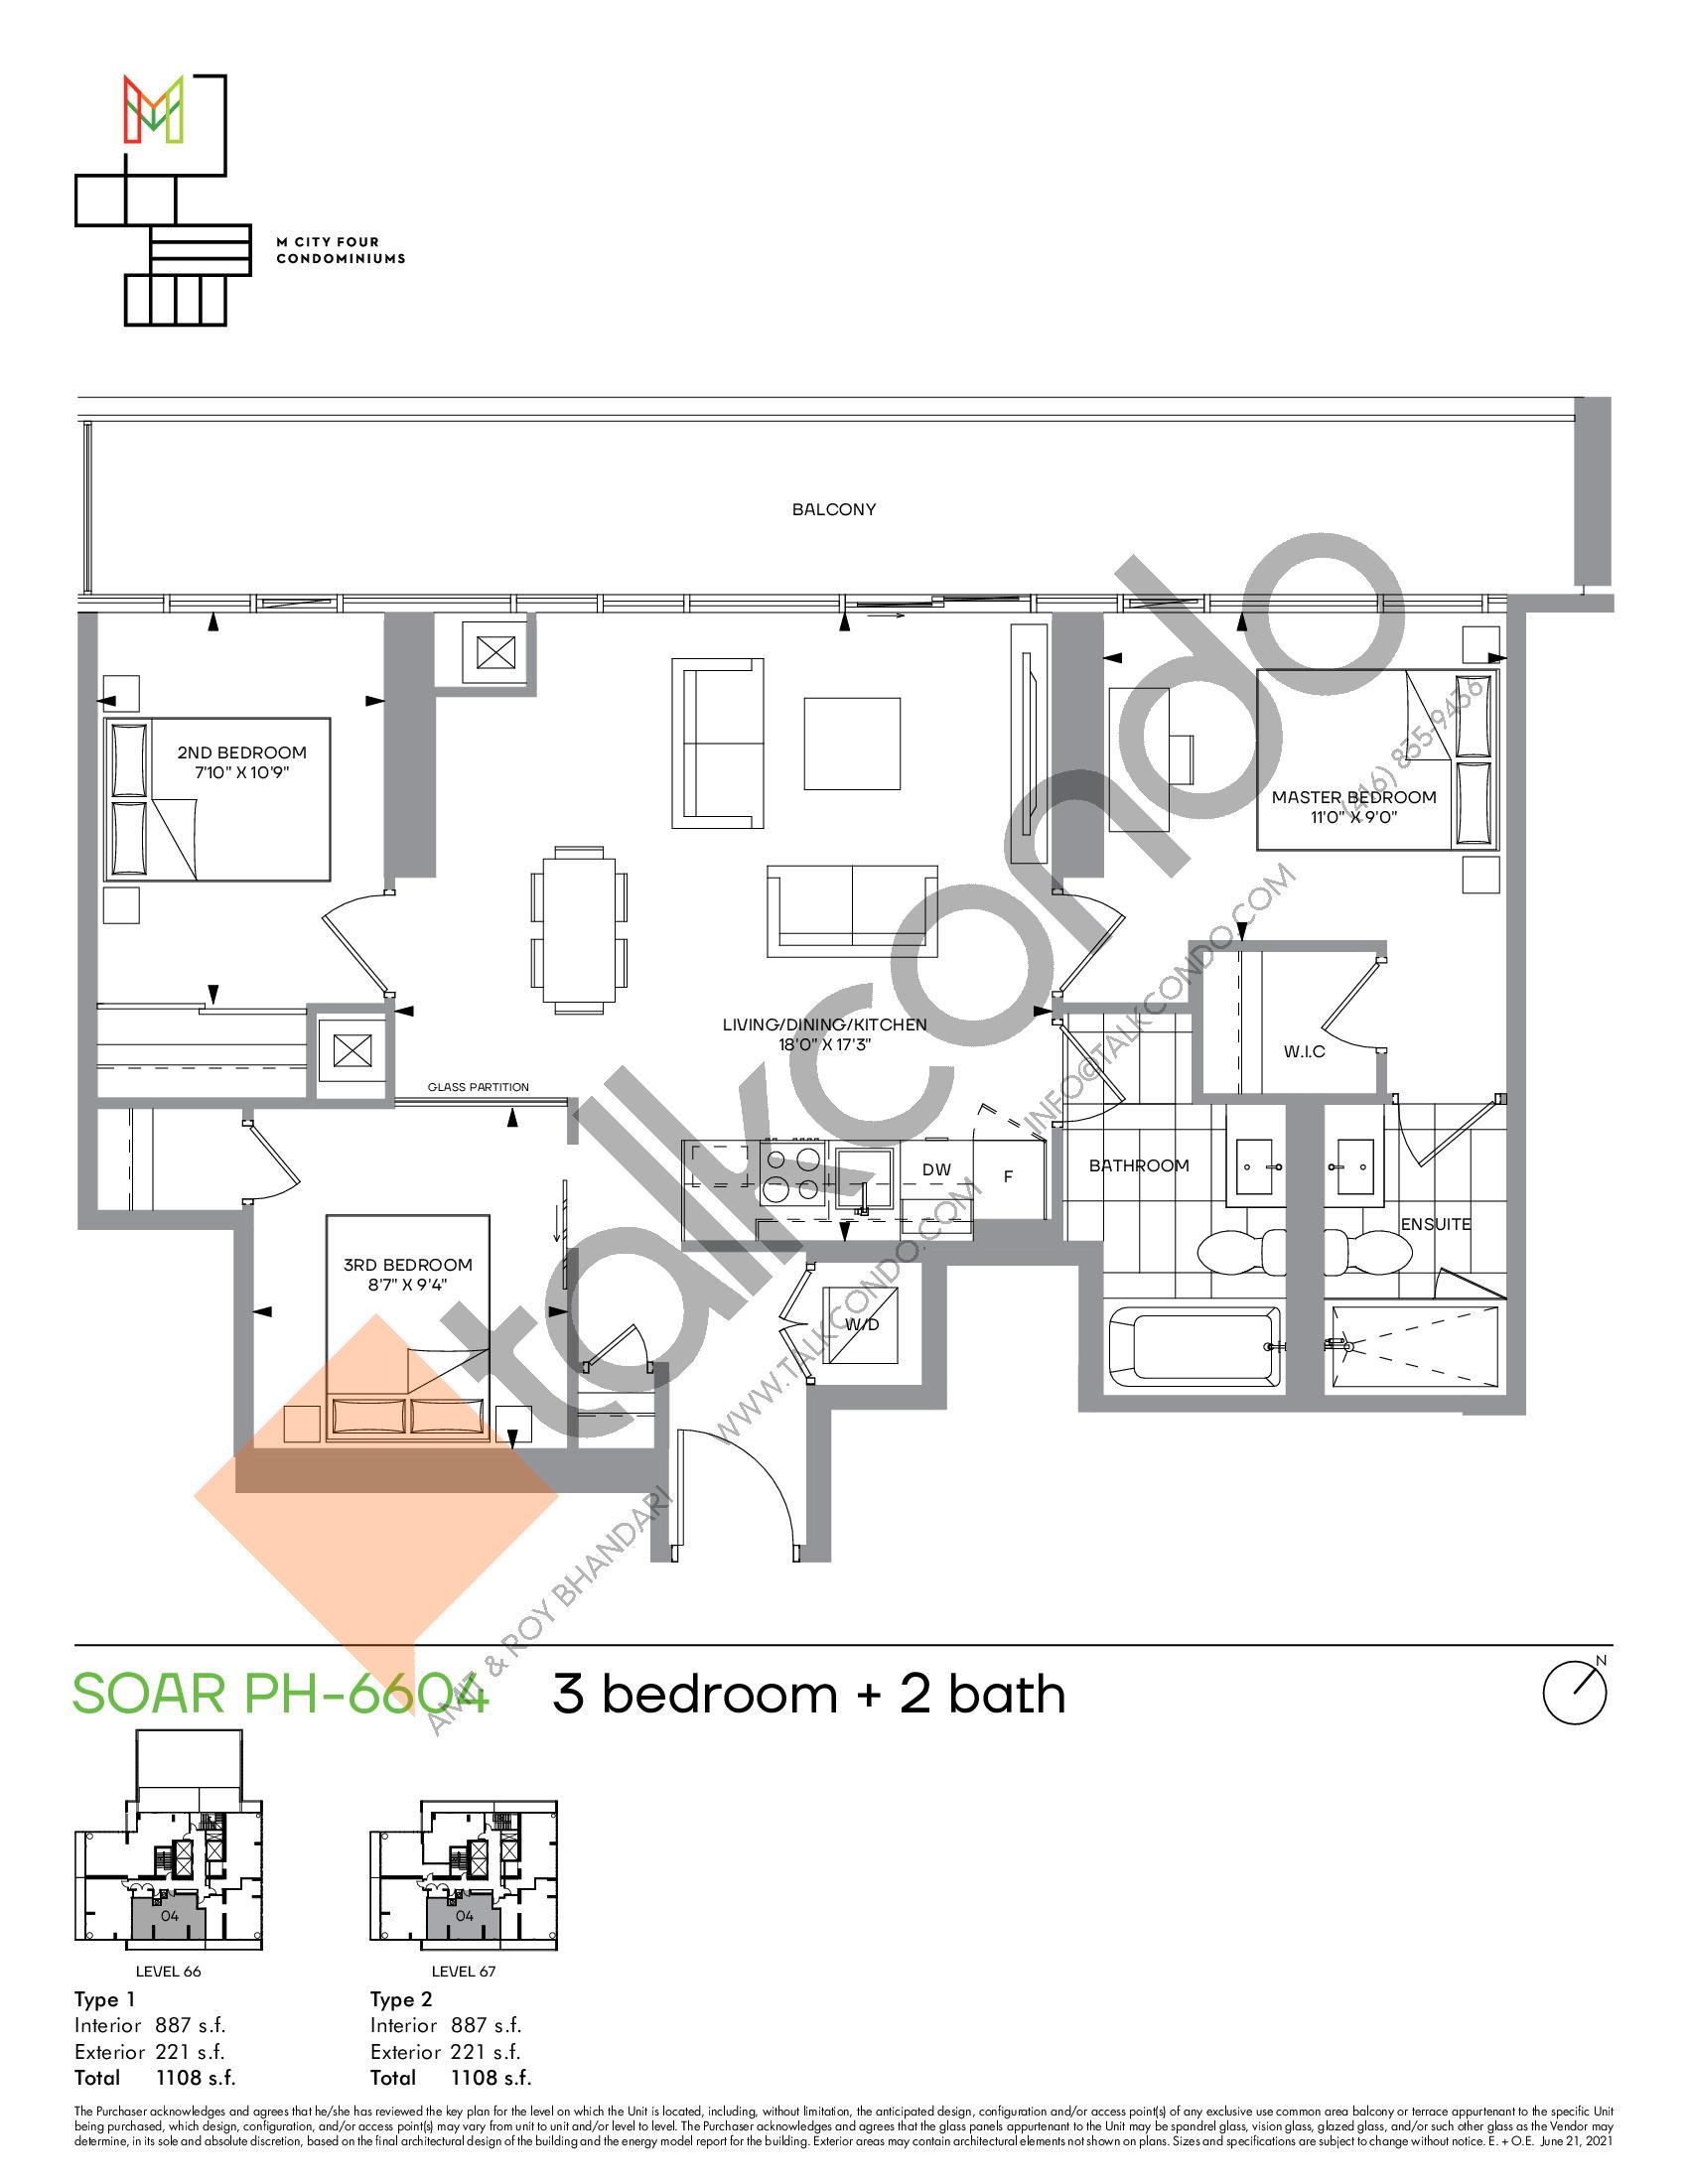 Soar PH-6604 Floor Plan at M4 Condos - 887 sq.ft